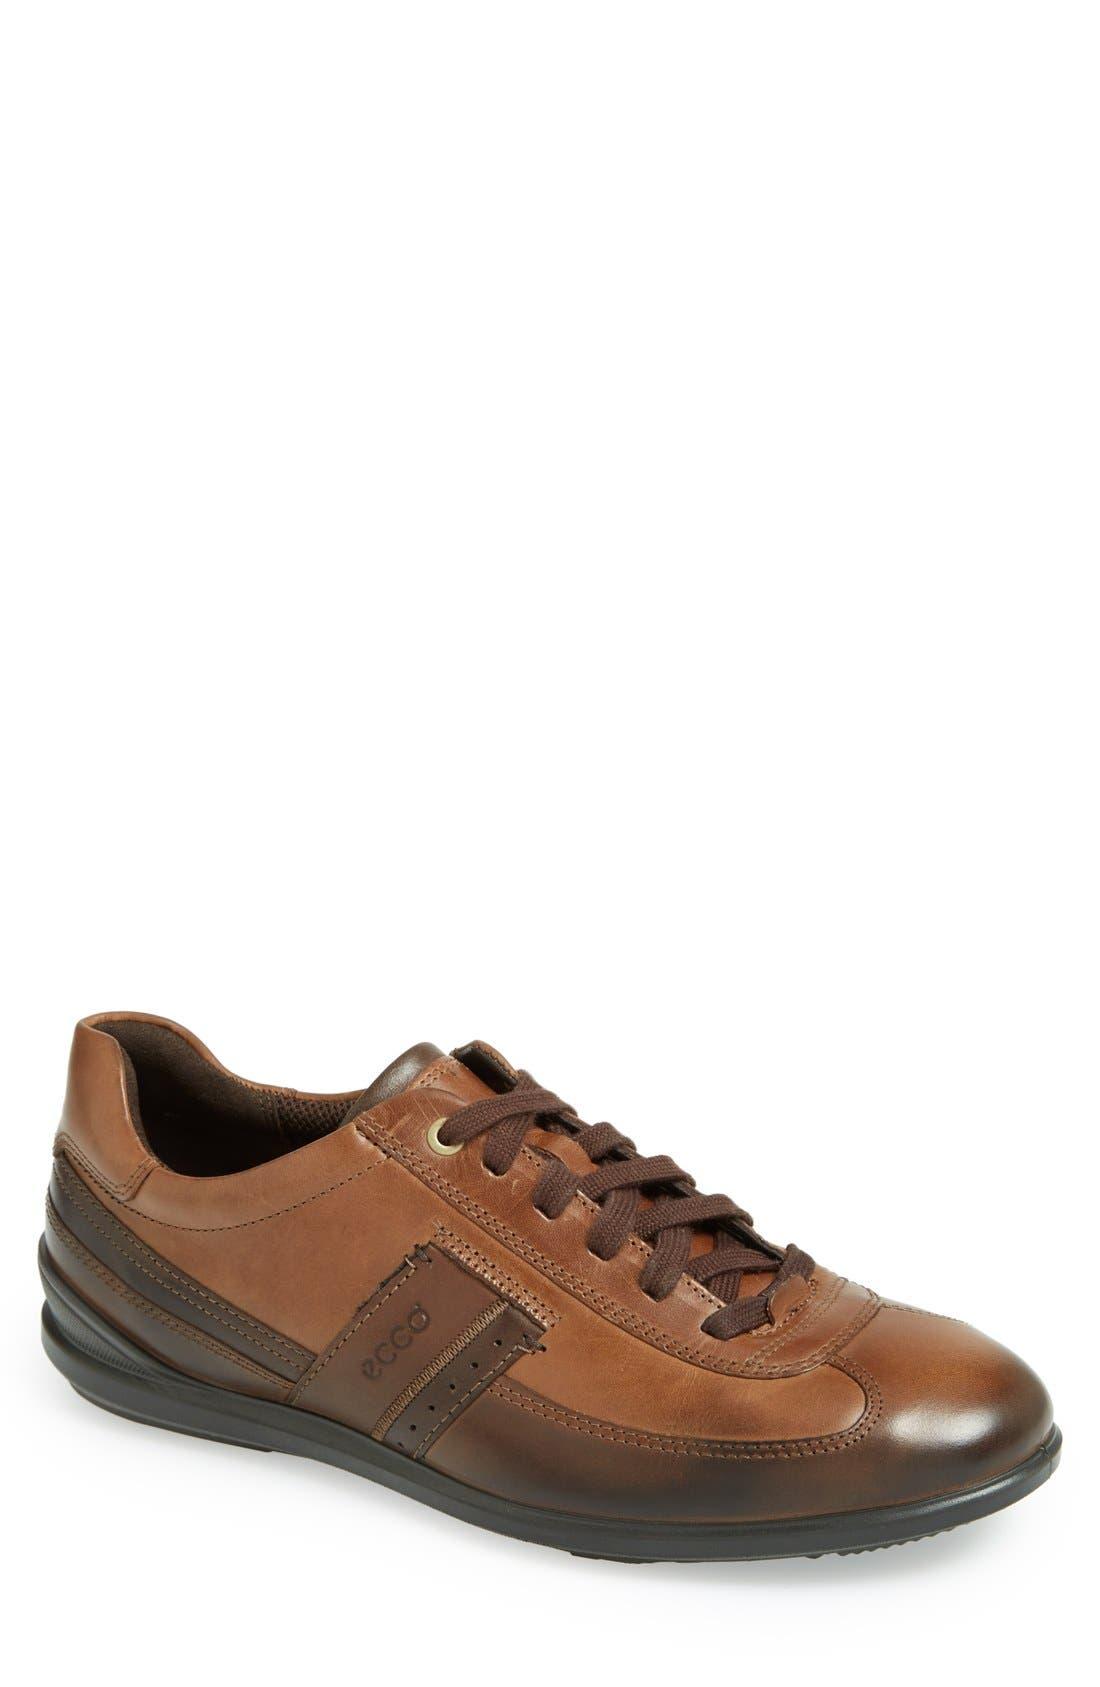 Alternate Image 1 Selected - ECCO 'Chander' Sneaker (Men)